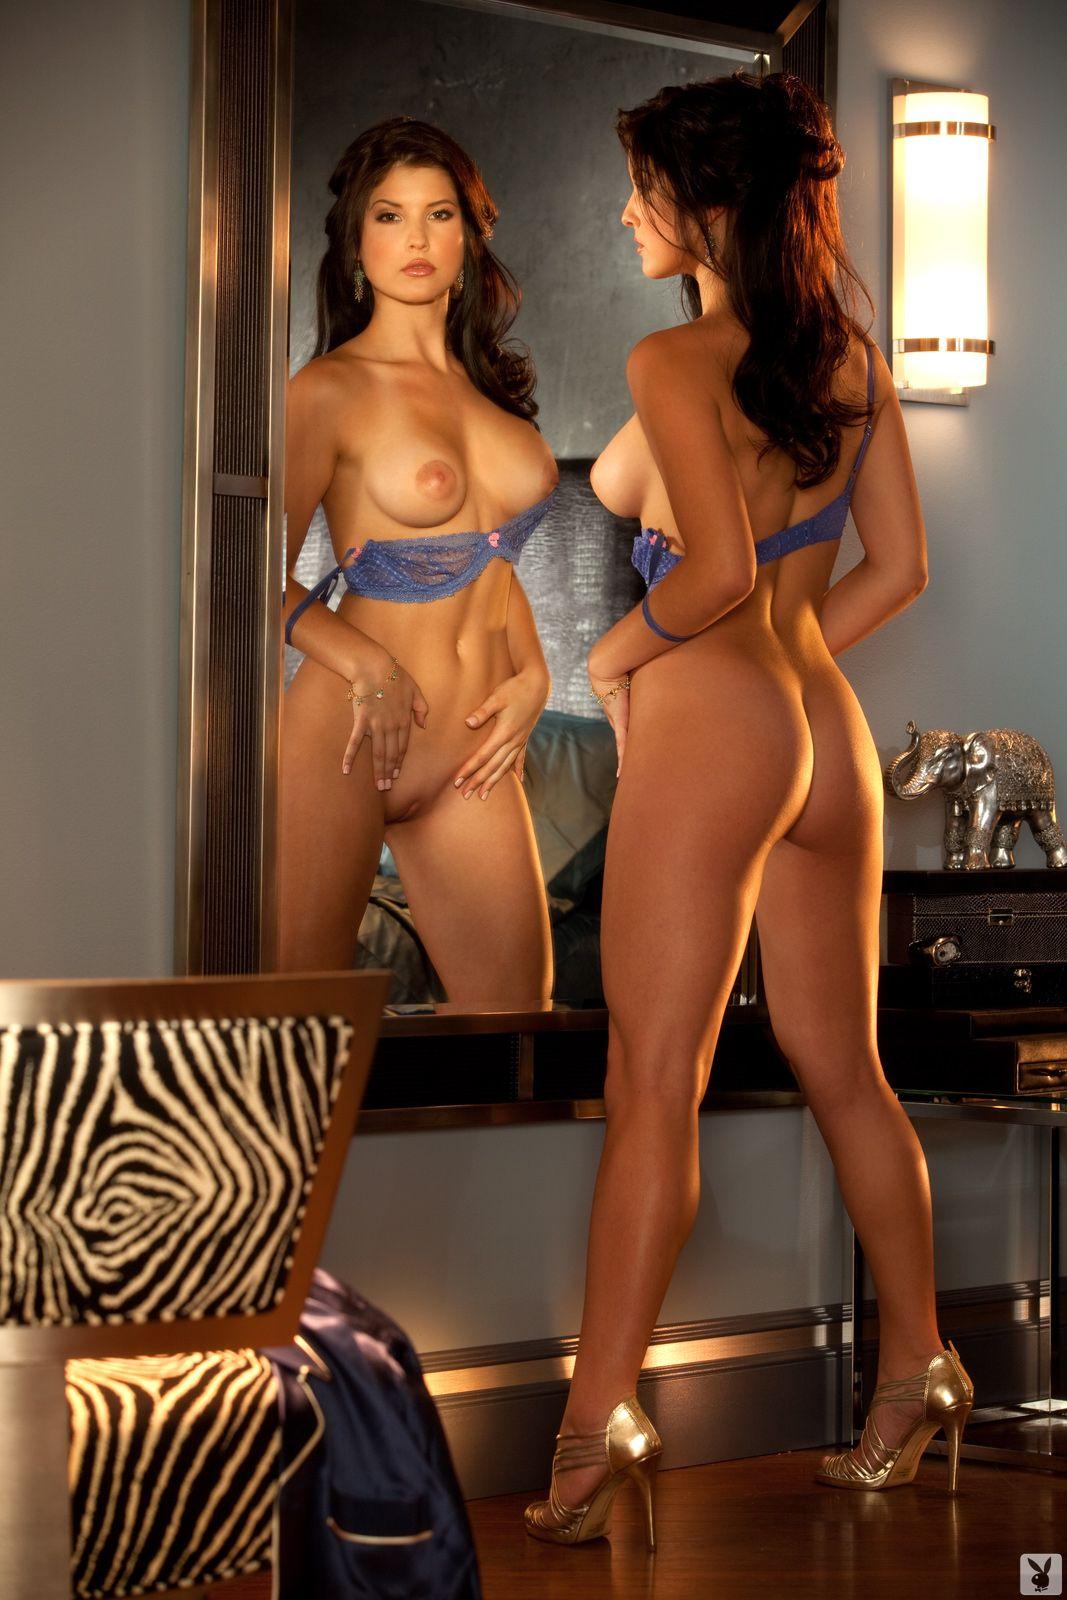 Amanda Cerny Video Porn amanda cerny nude thefappening one - xxxpicss